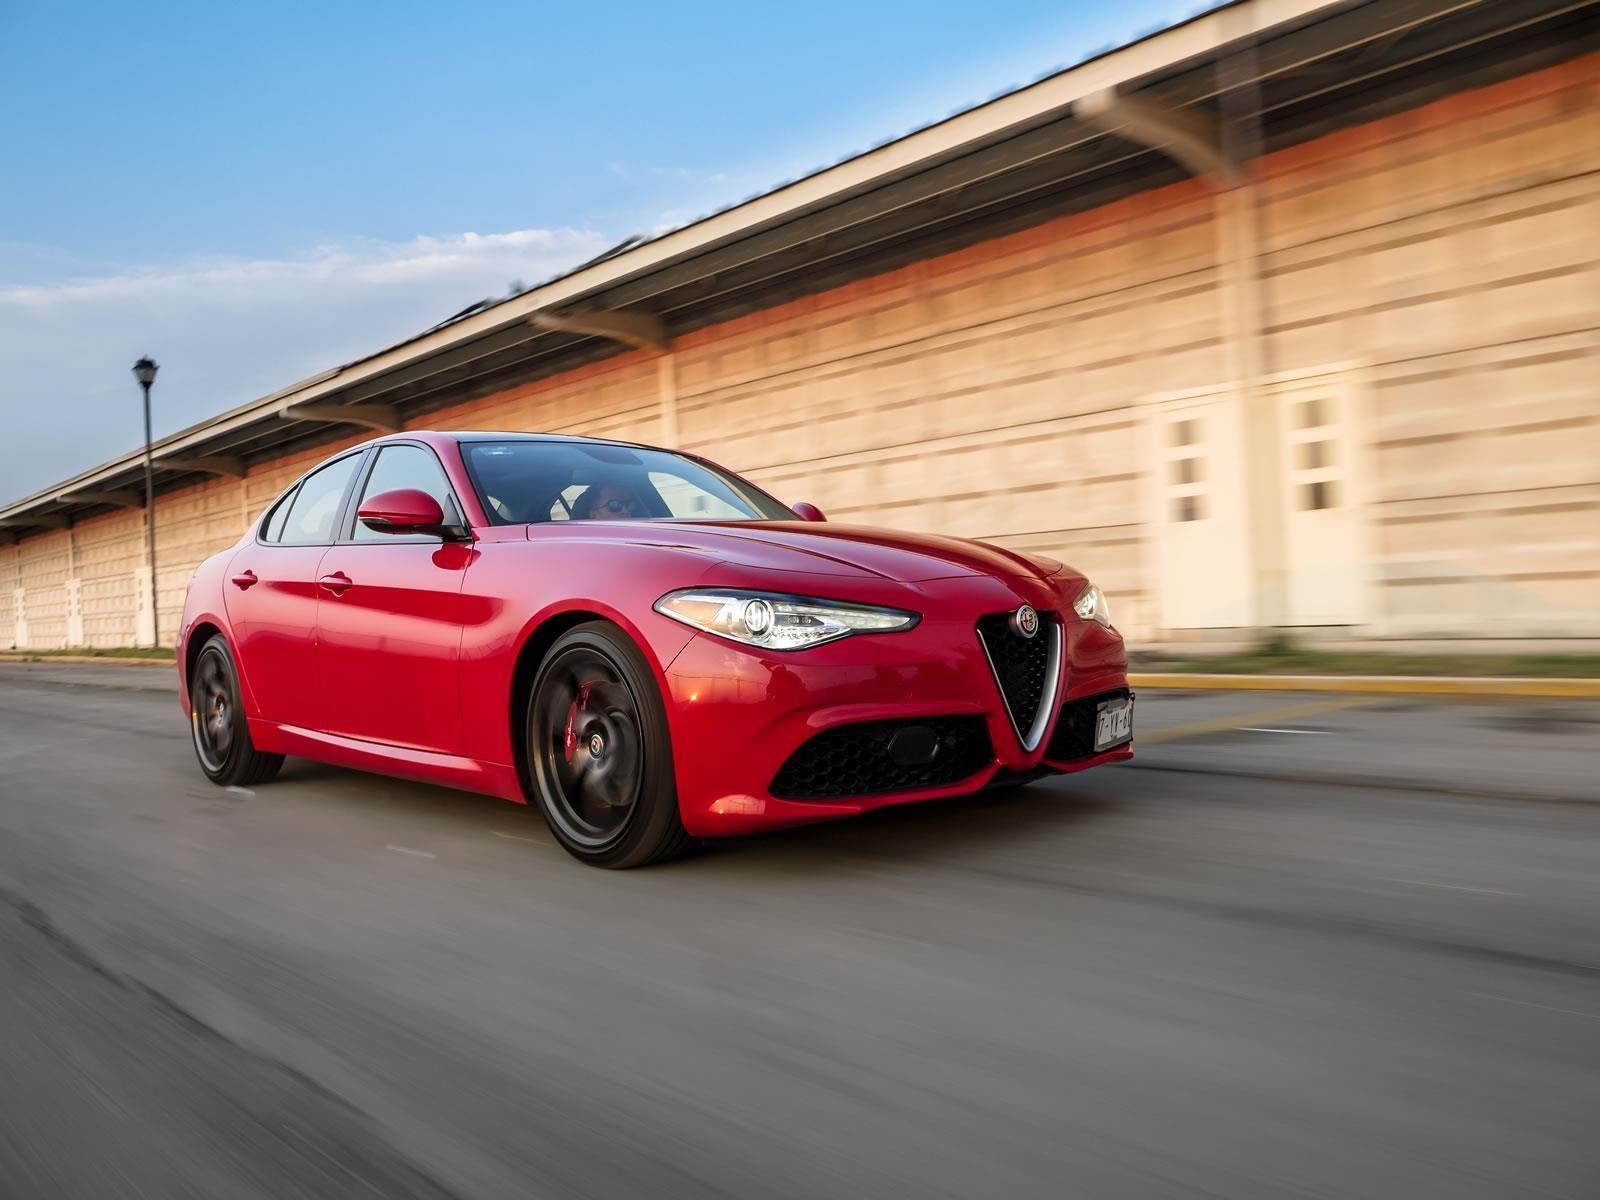 Manejamos el Alfa Romeo Giulia 2017